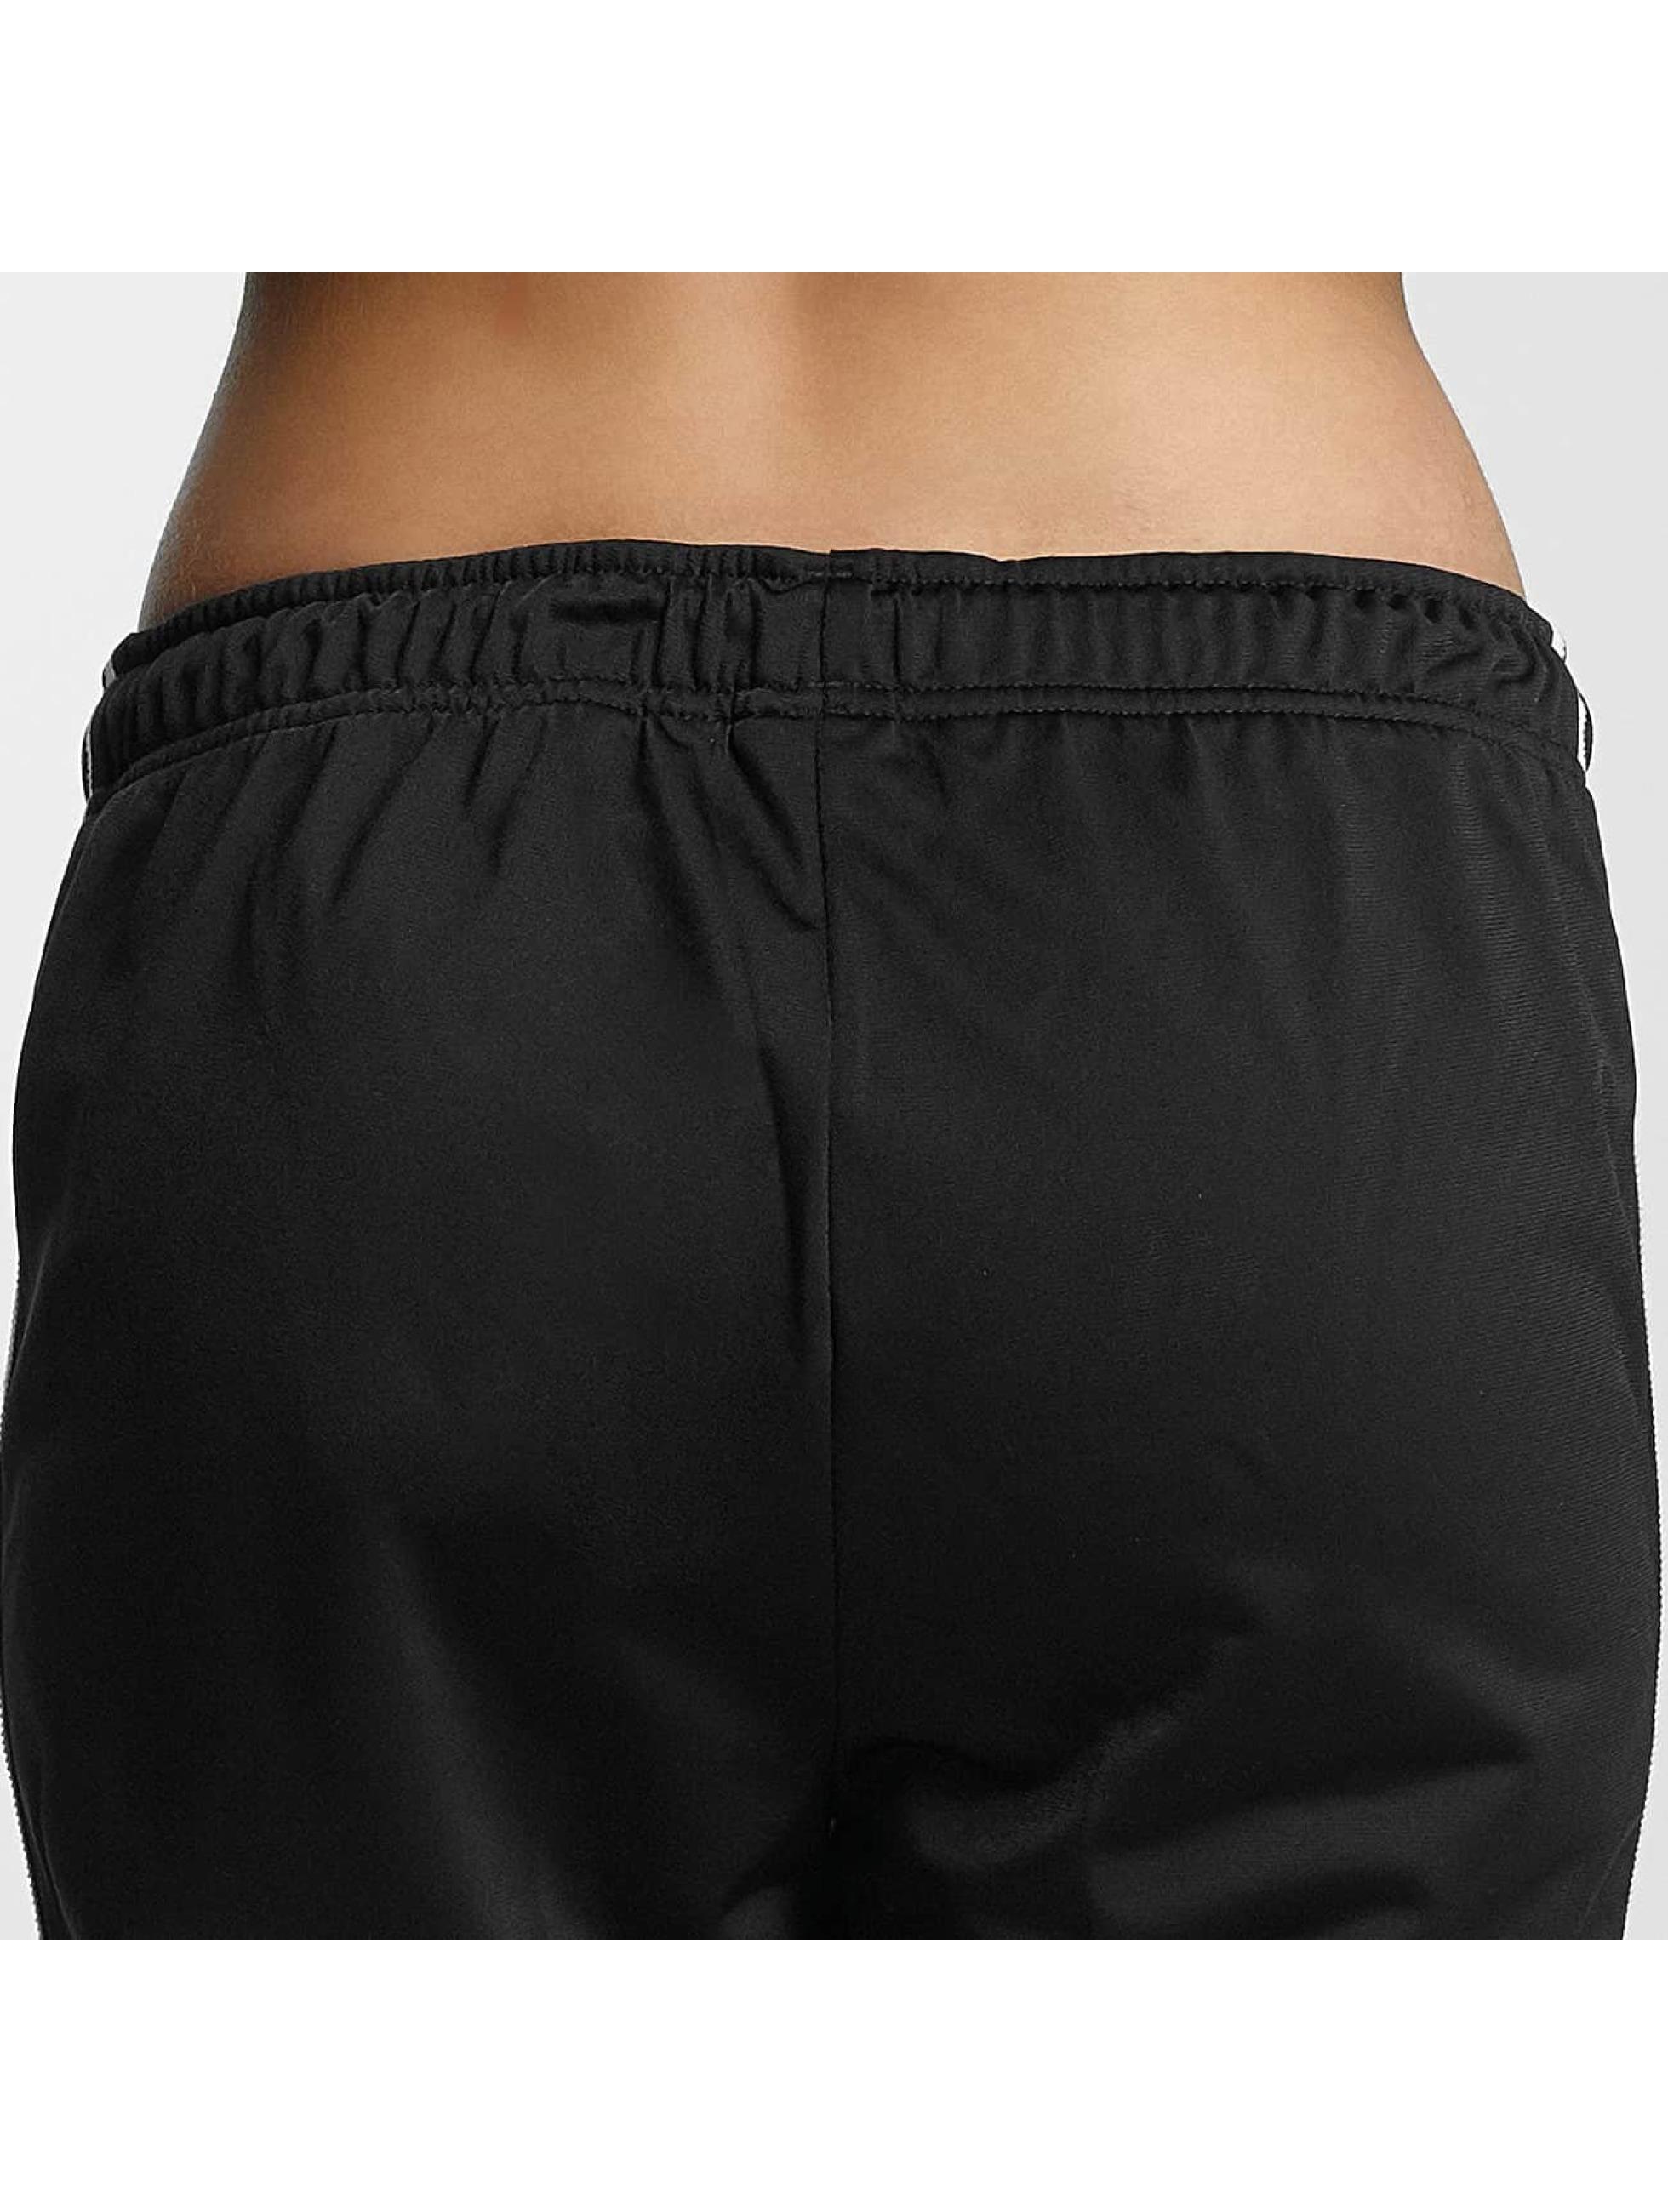 adidas Spodnie do joggingu Cigarette czarny